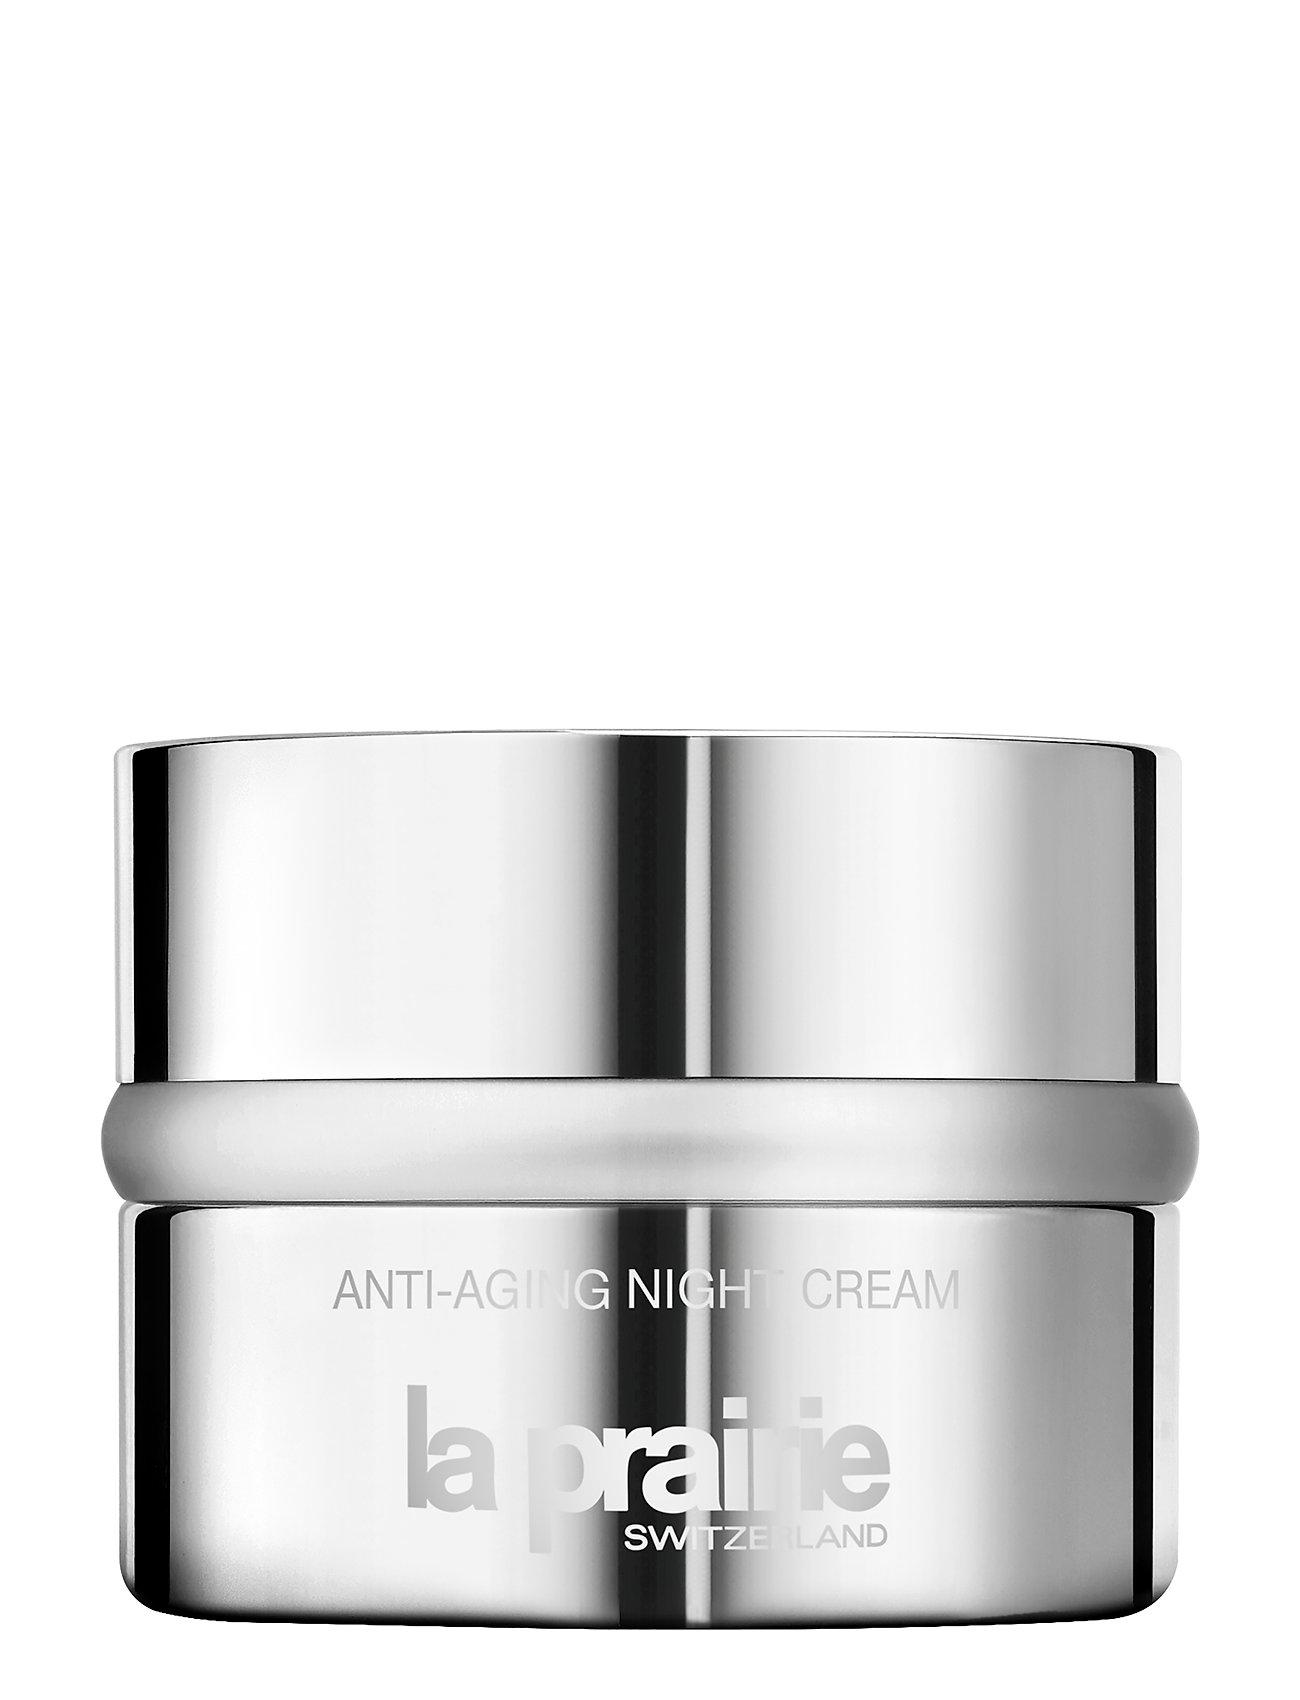 La Prairie ANTI-AGING NIGHT CREAM - NO COLOR